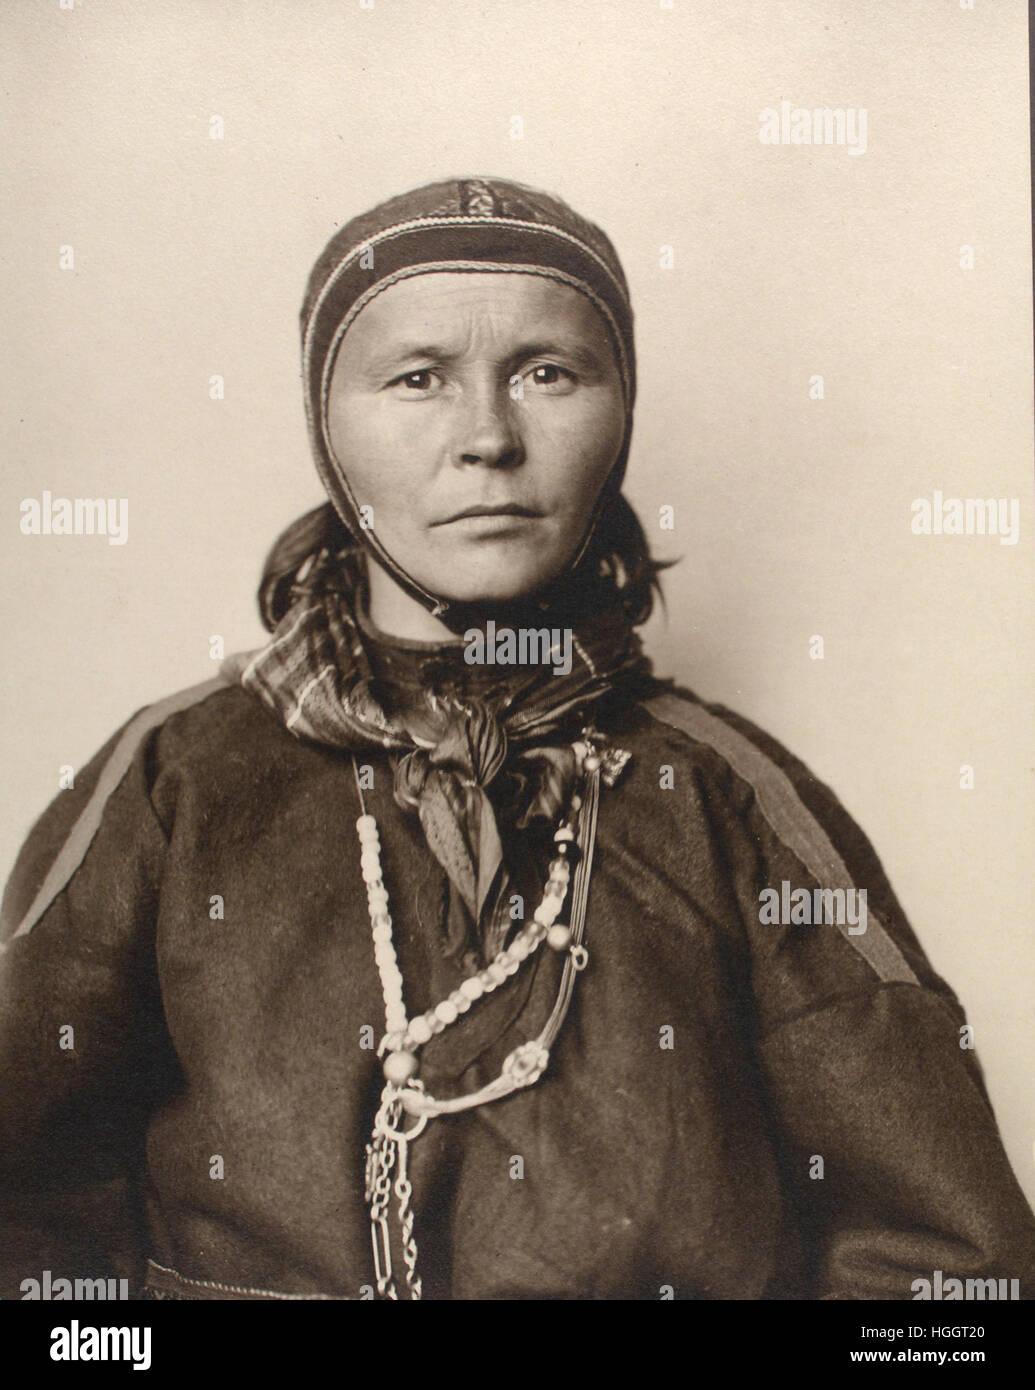 Portrait of Laplander - Ellis Island Immigration Station 1902-1913 - Photo : Augustus Sherman - Stock Image